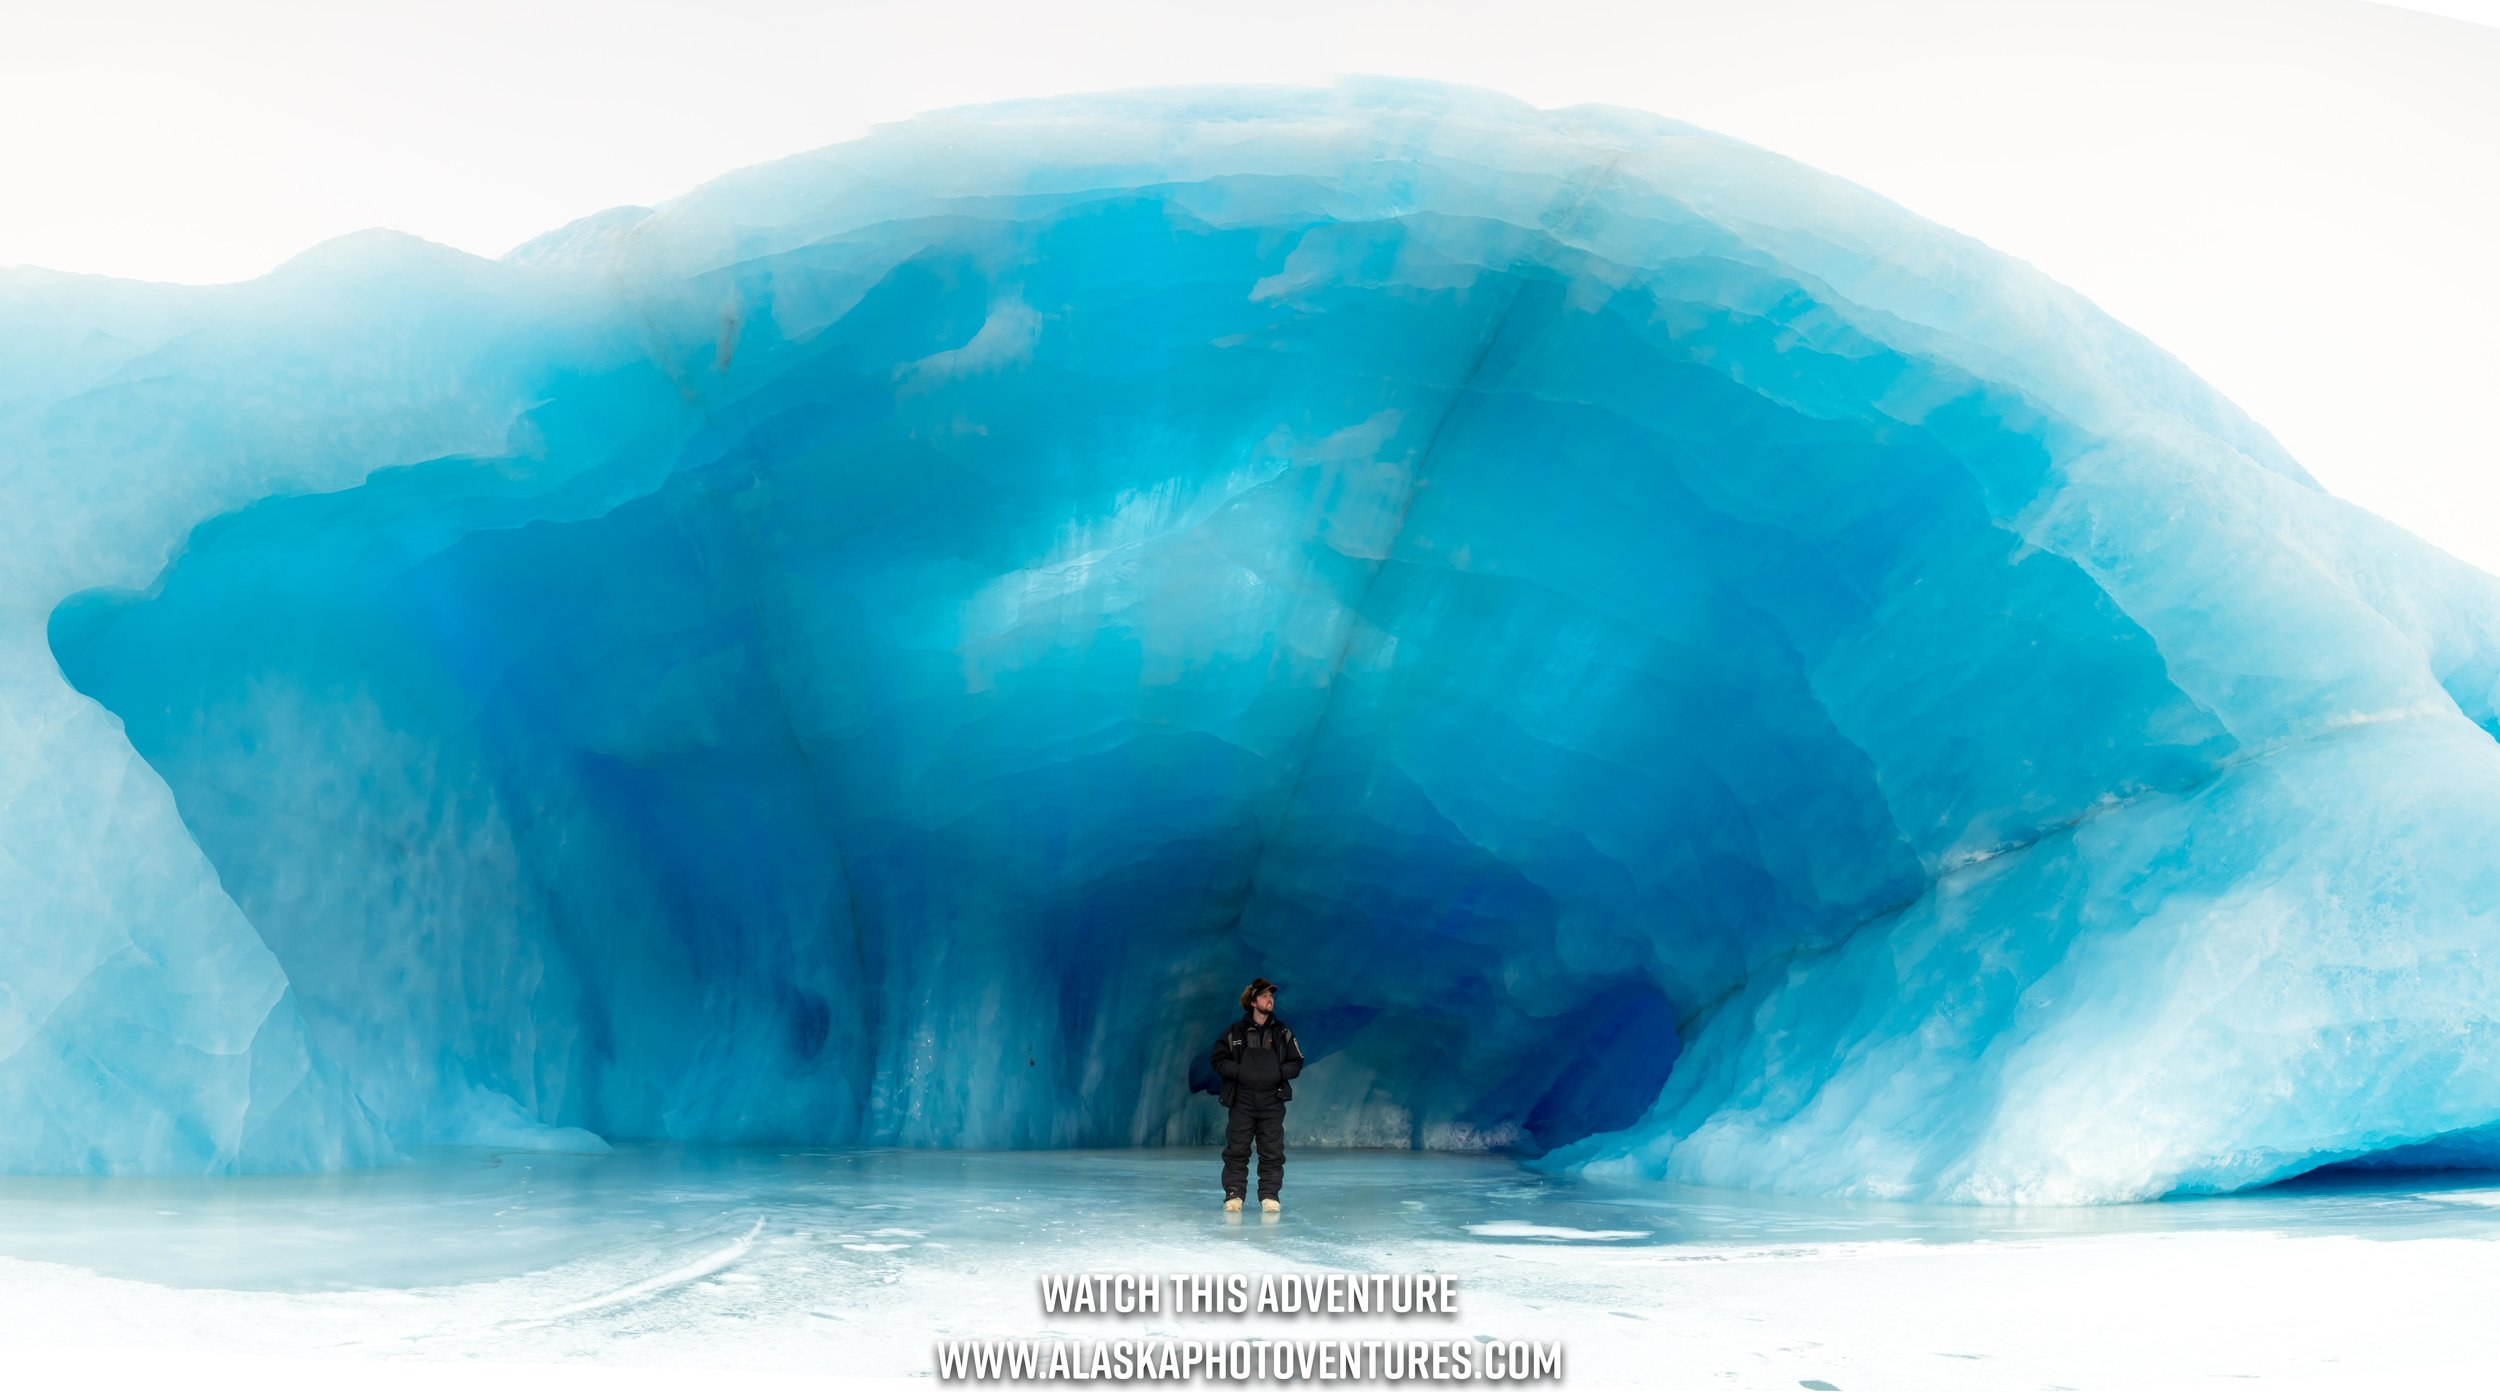 colony-glacier-adventure-photography-tv-show-alaska.jpg1.jpg